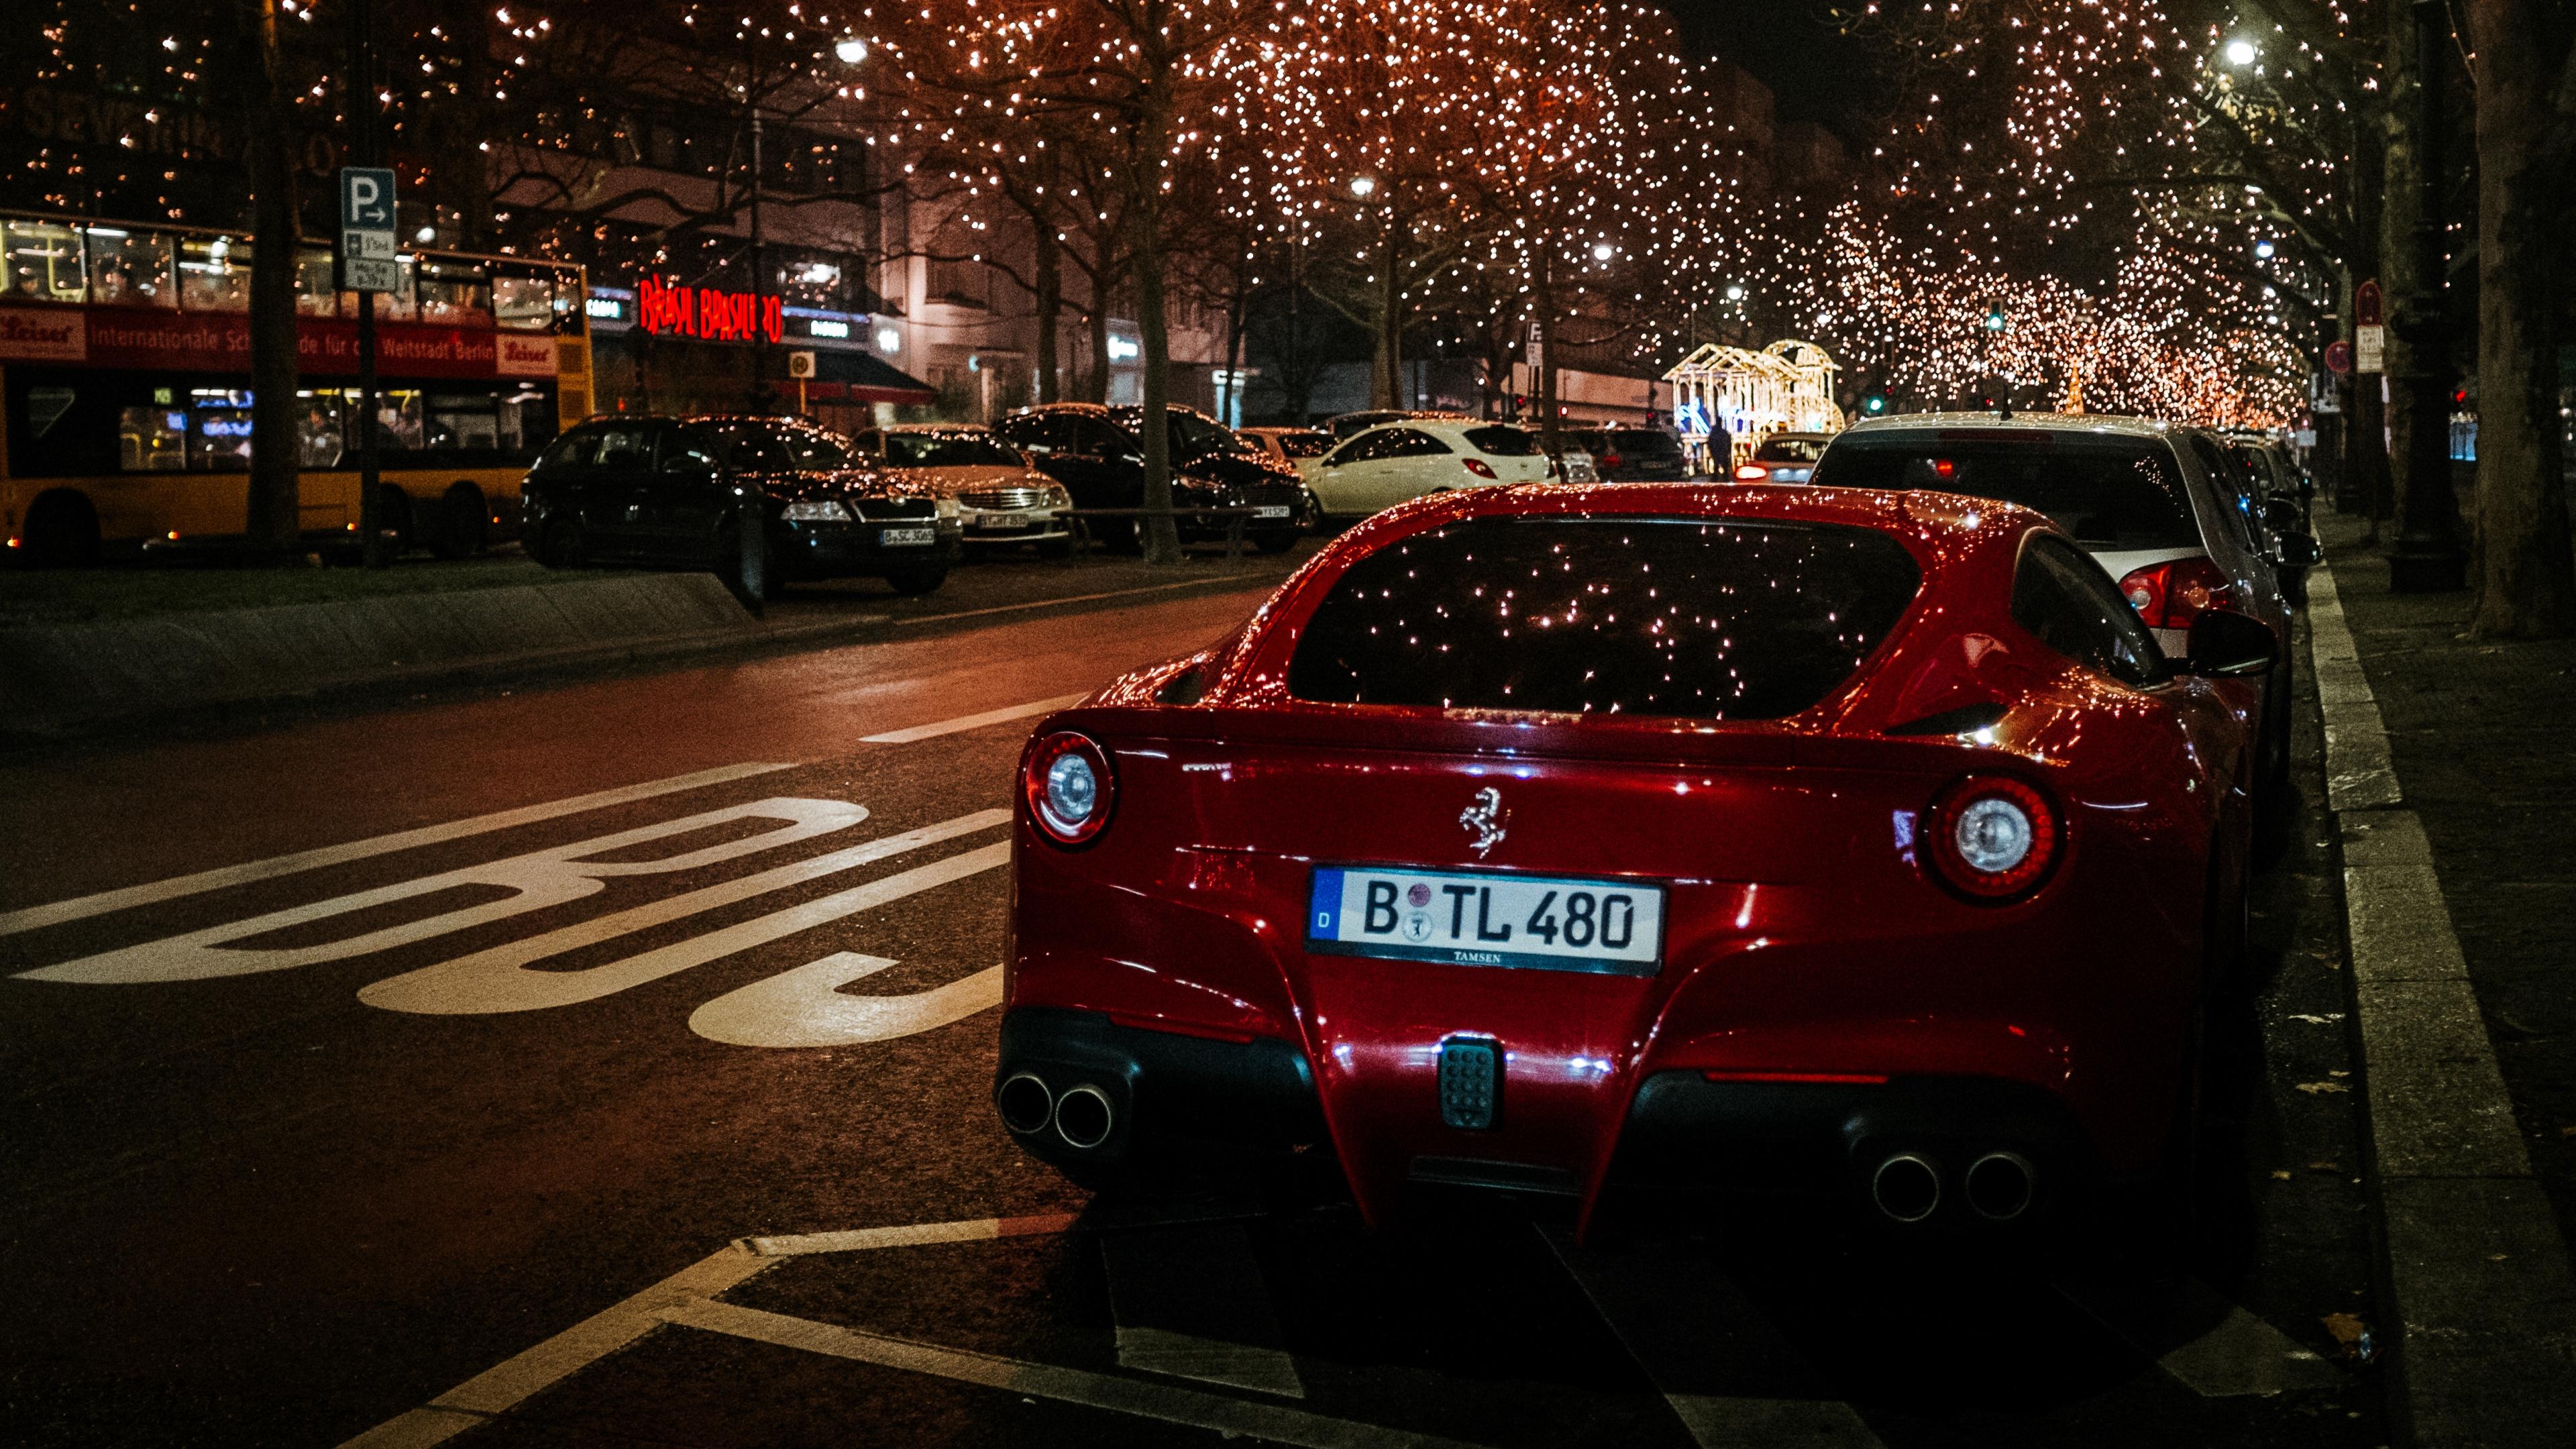 ferrari rear view red night city scenery 4k 1538935278 - ferrari, rear view, red, night city, scenery 4k - red, rear view, Ferrari